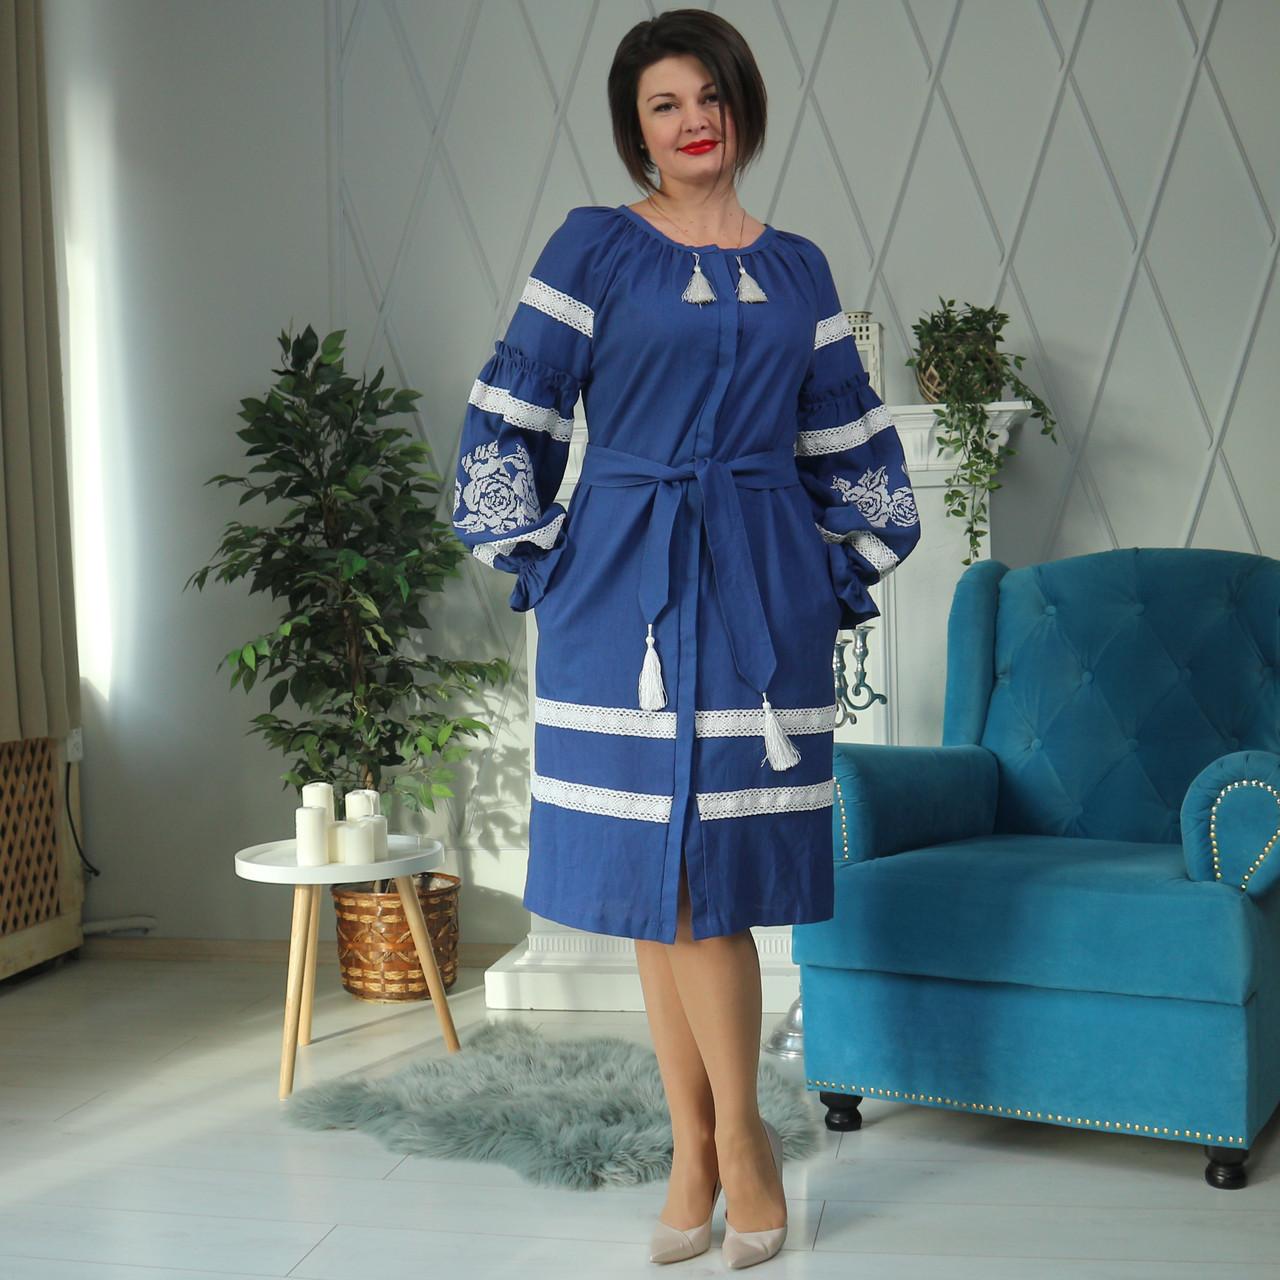 "Жіноче вишите плаття "" Белінда"" (Женское вышитое платье "" Белинда"") PJ-0026"